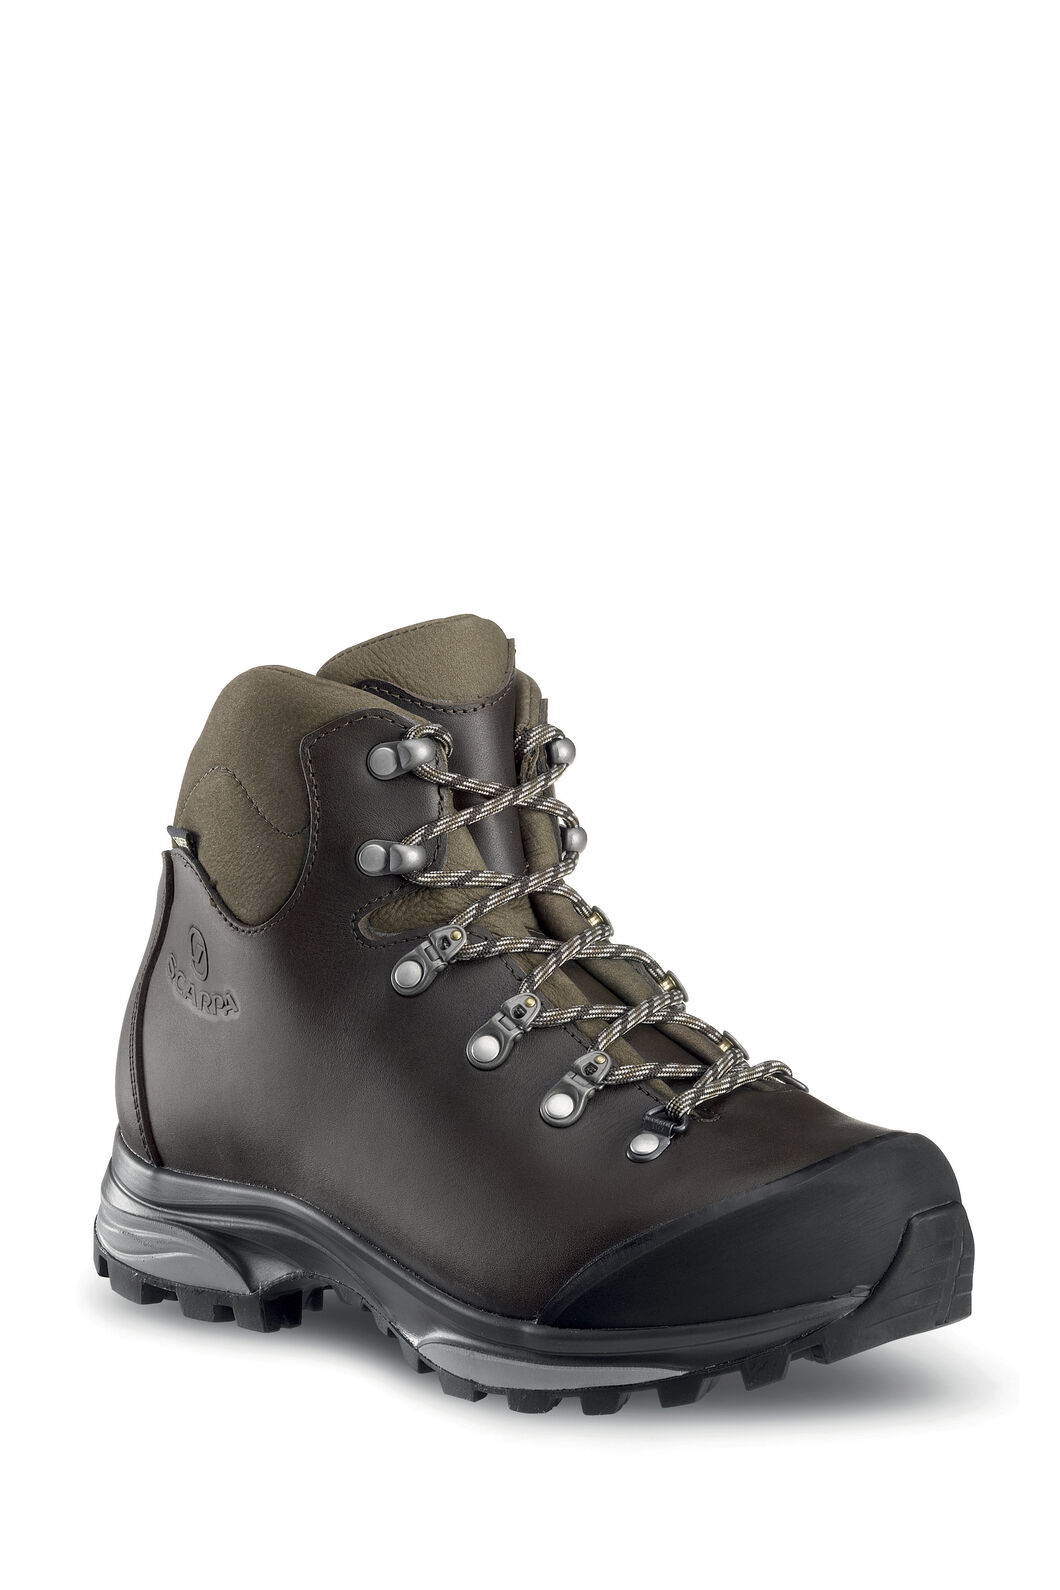 Scarpa Delta GTX Boots, Brown, hi-res